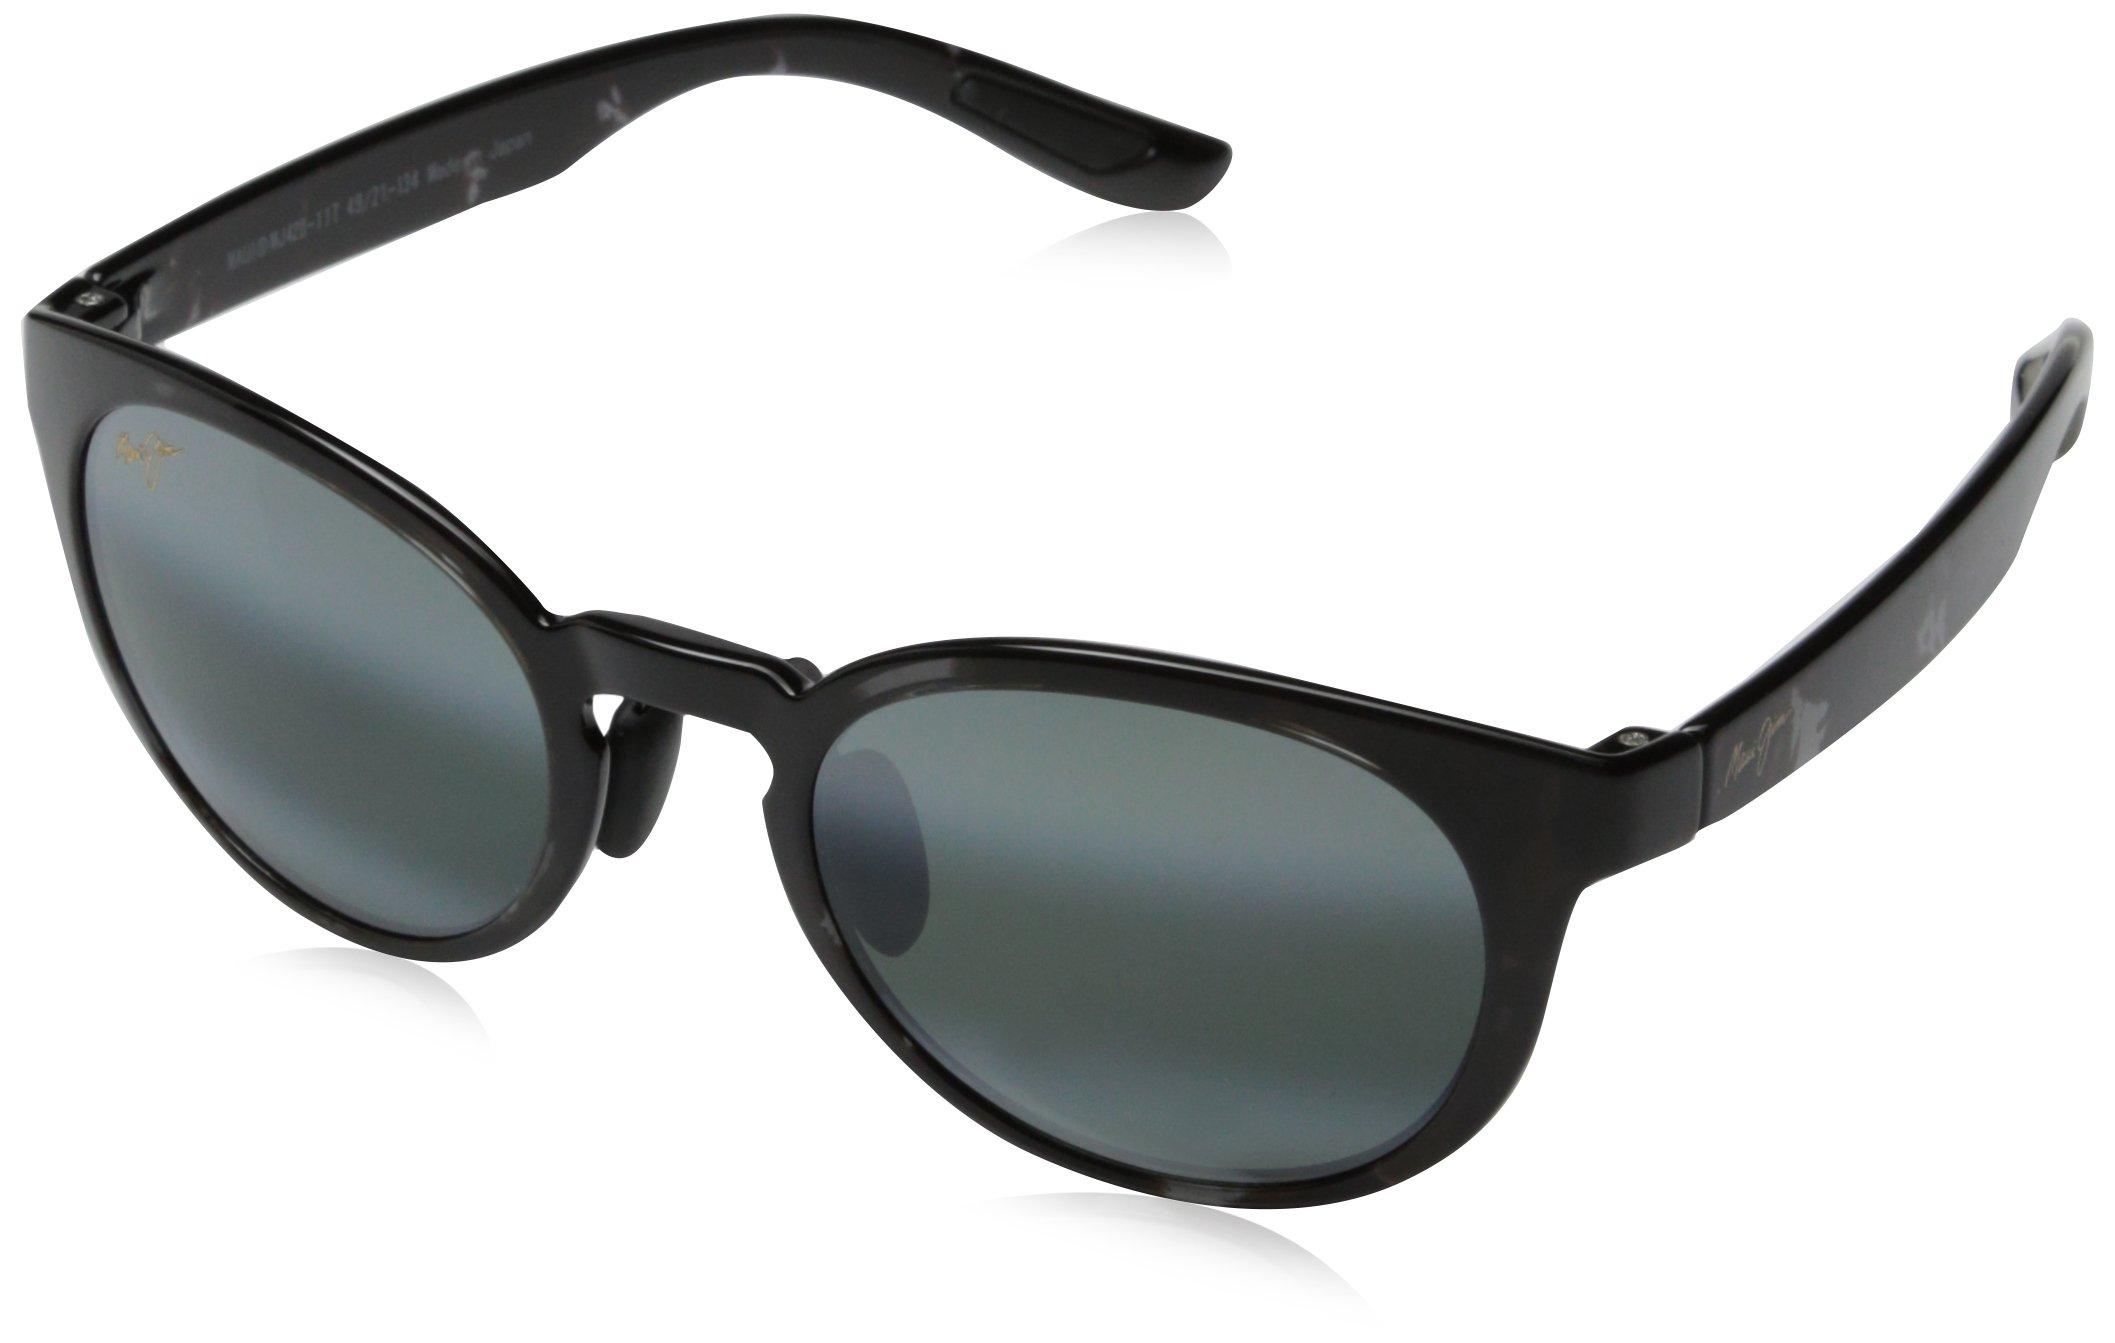 Maui Jim - Keanae - Black/Grey Tortoise Frame- Polarized Neutral Grey Lenses